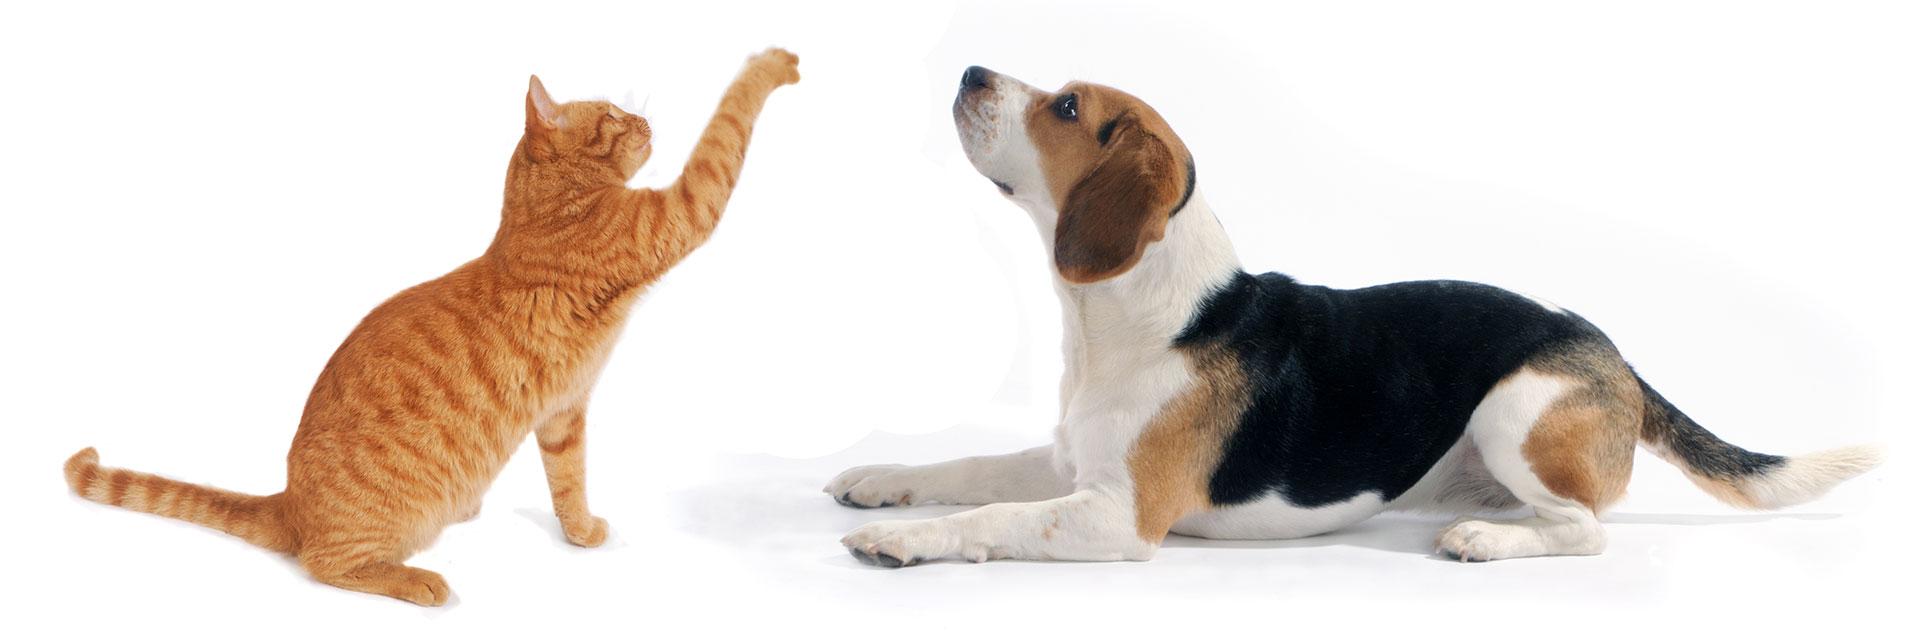 Orange cat and beagle